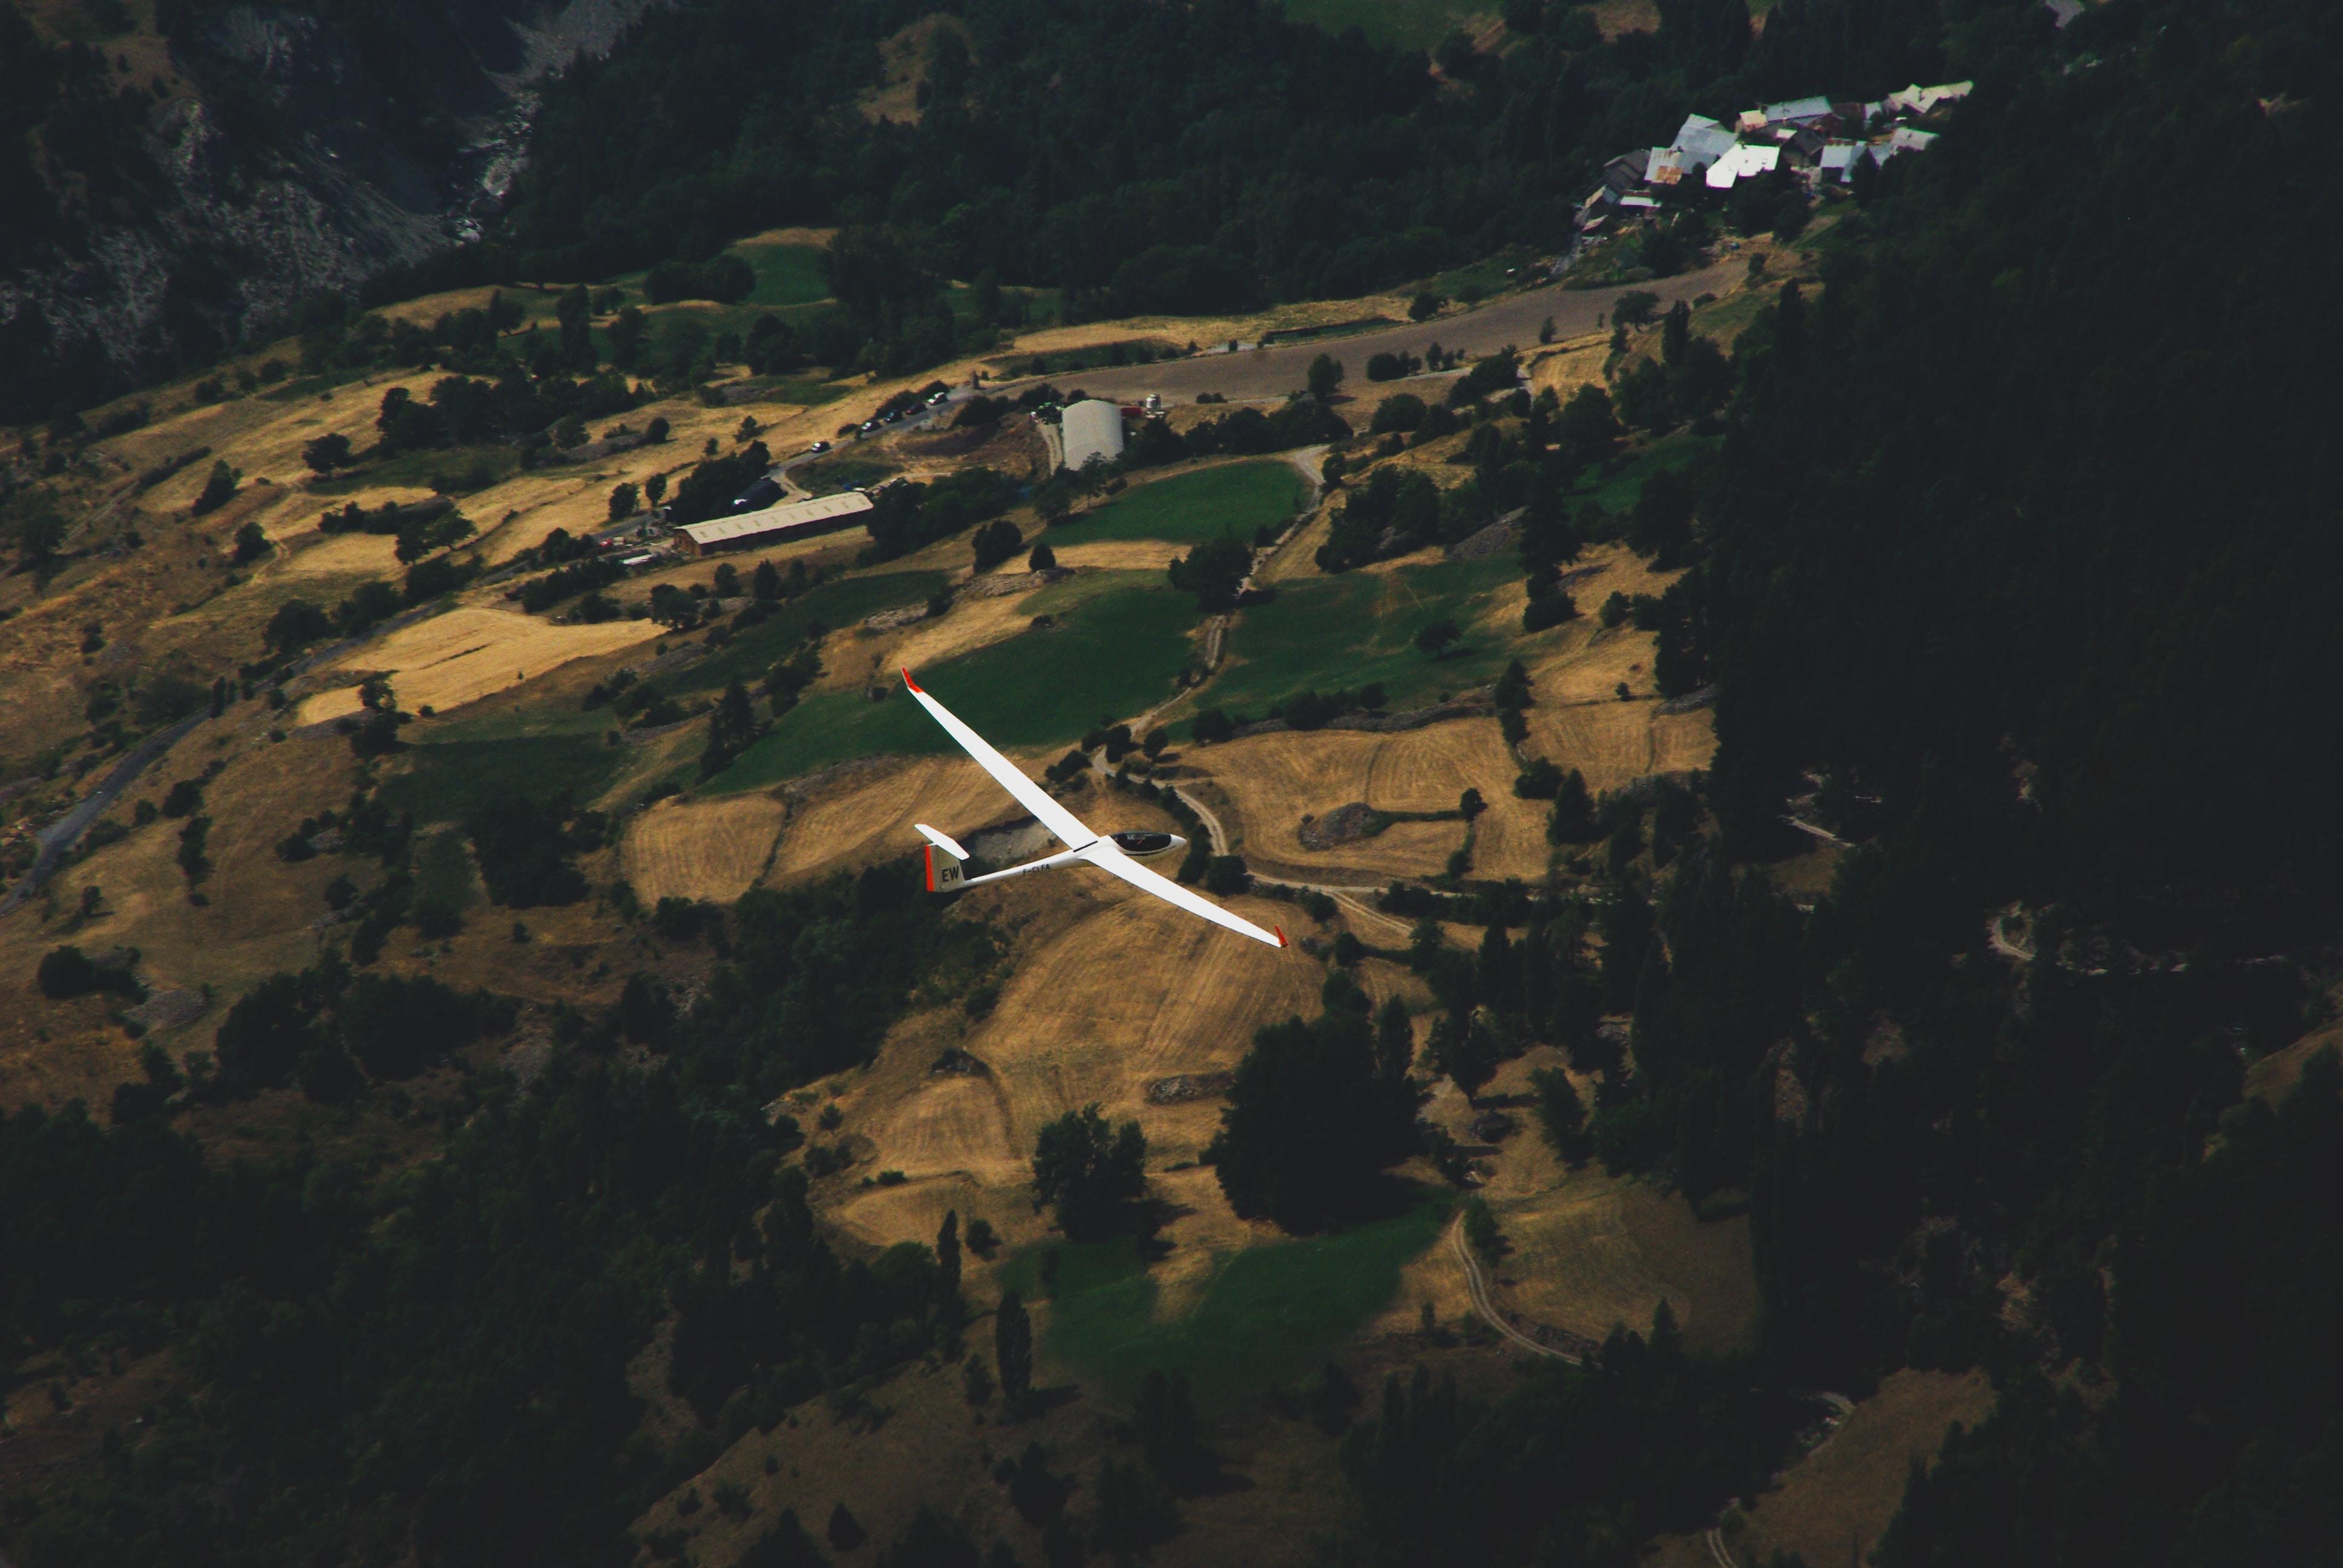 monoplane on midair